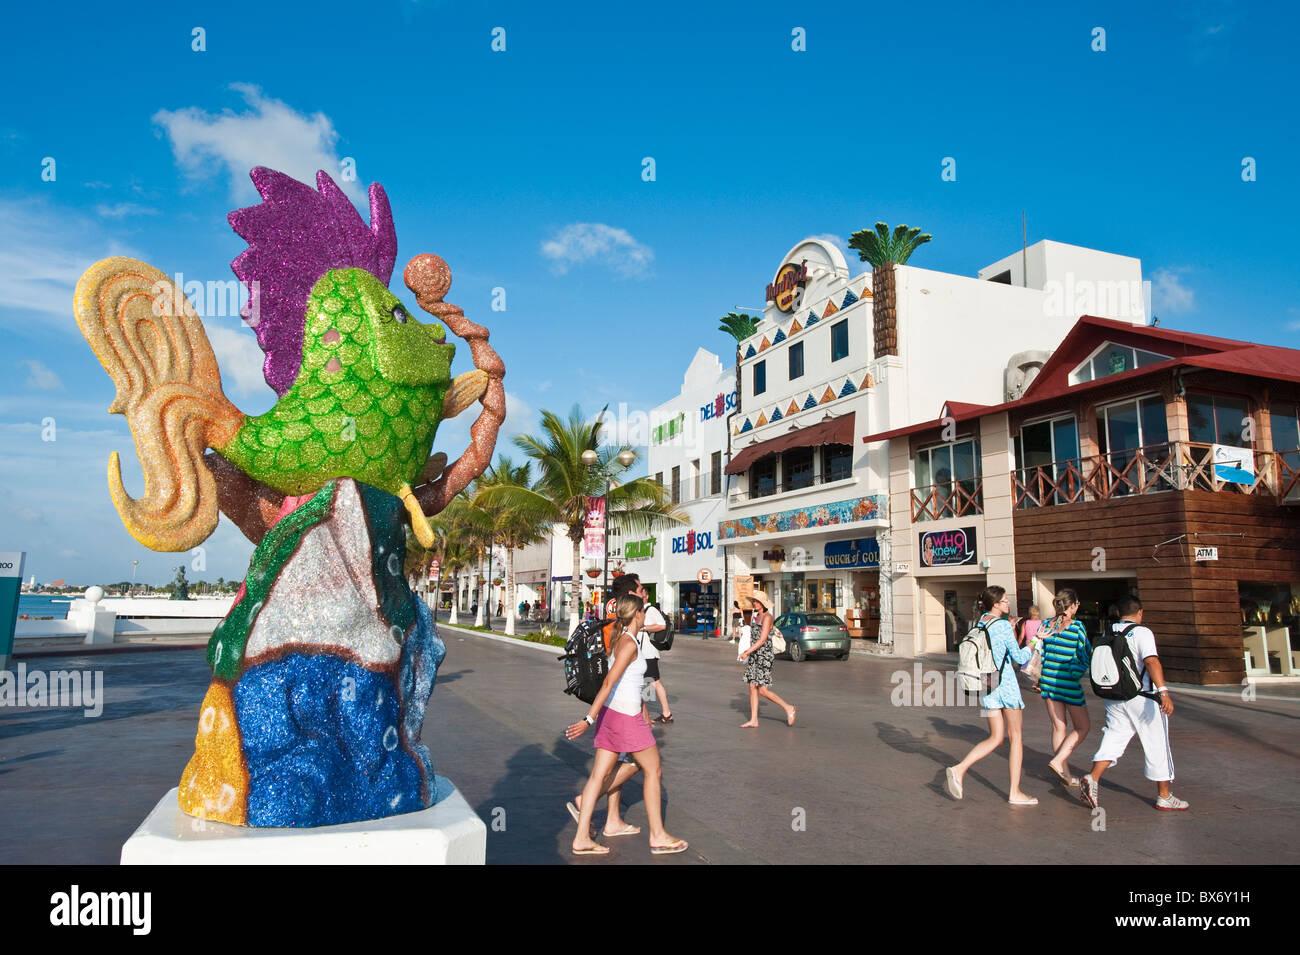 Carnival decorations in San Miguel, Isla de Cozumel (Cozumel Island), Cozumel, off the Yucatan, Quintana Roo, Mexico - Stock Image